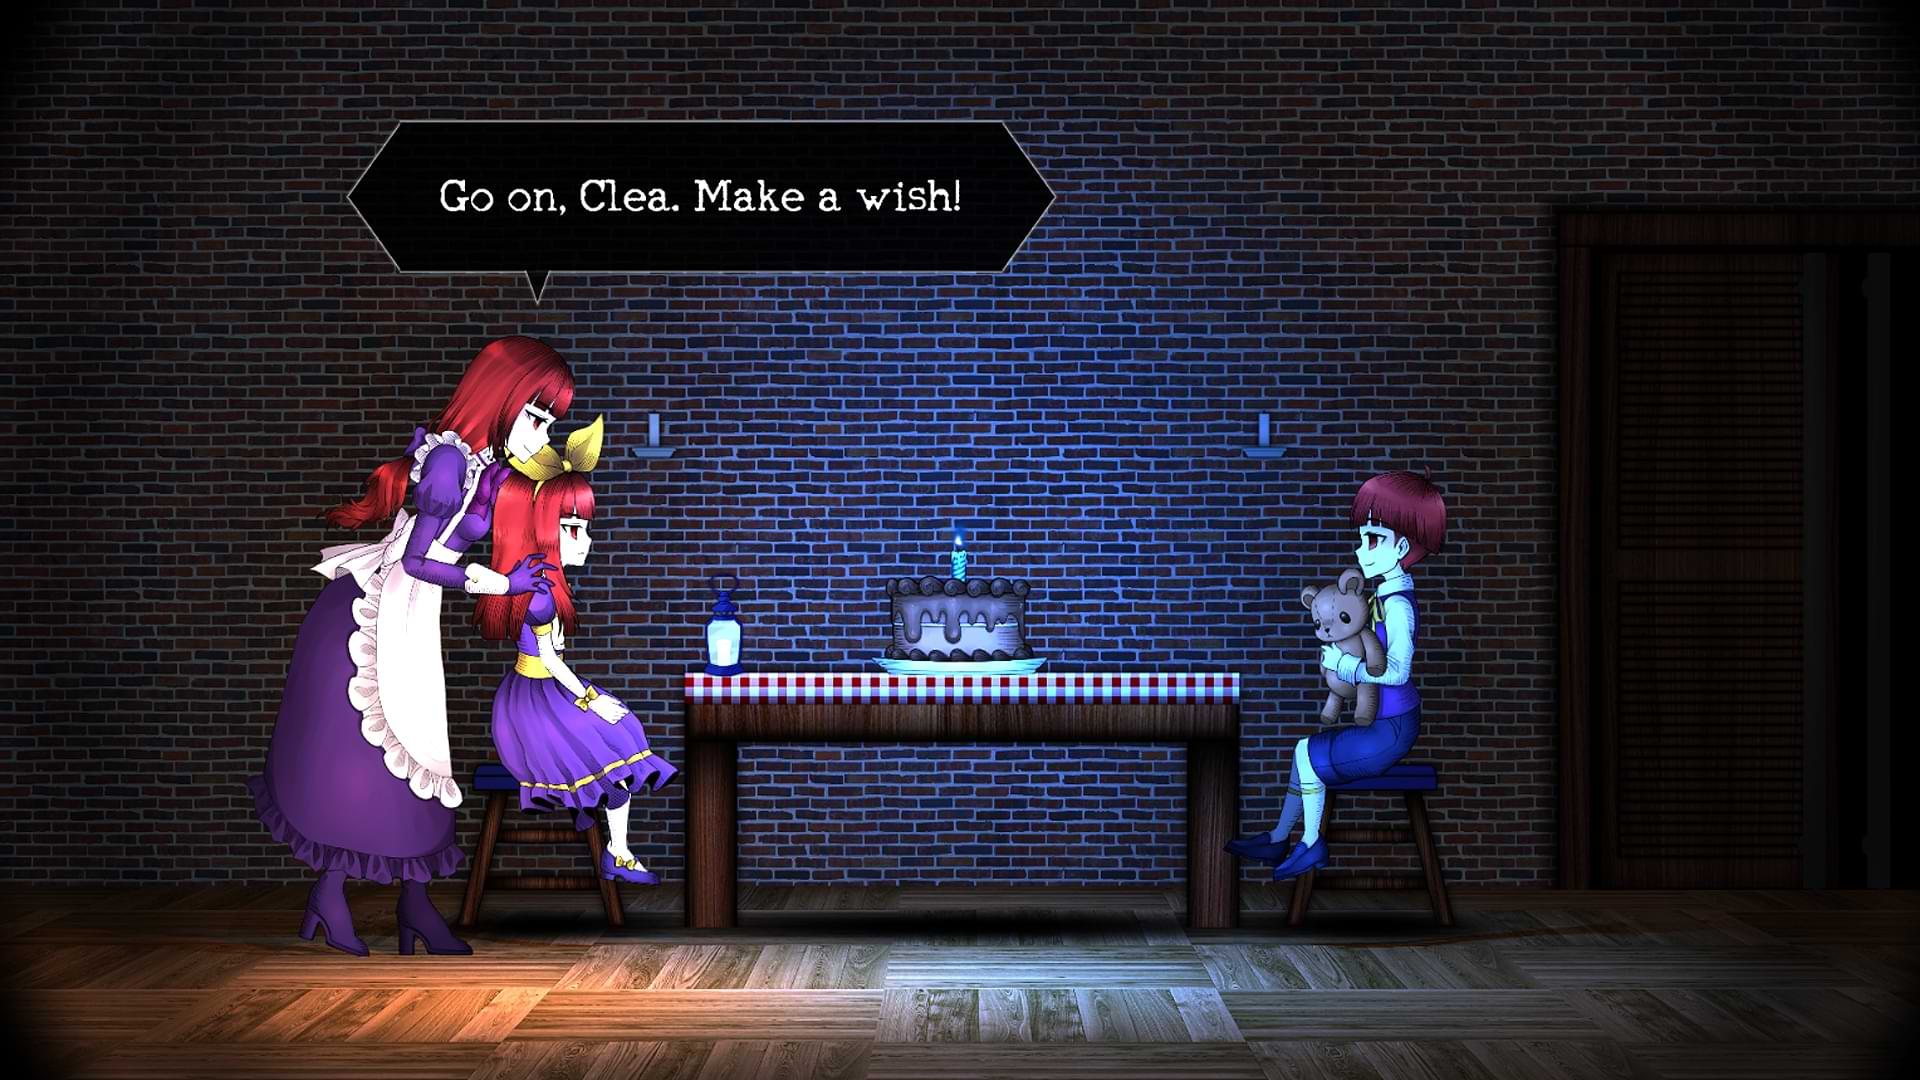 Clea - Birthday